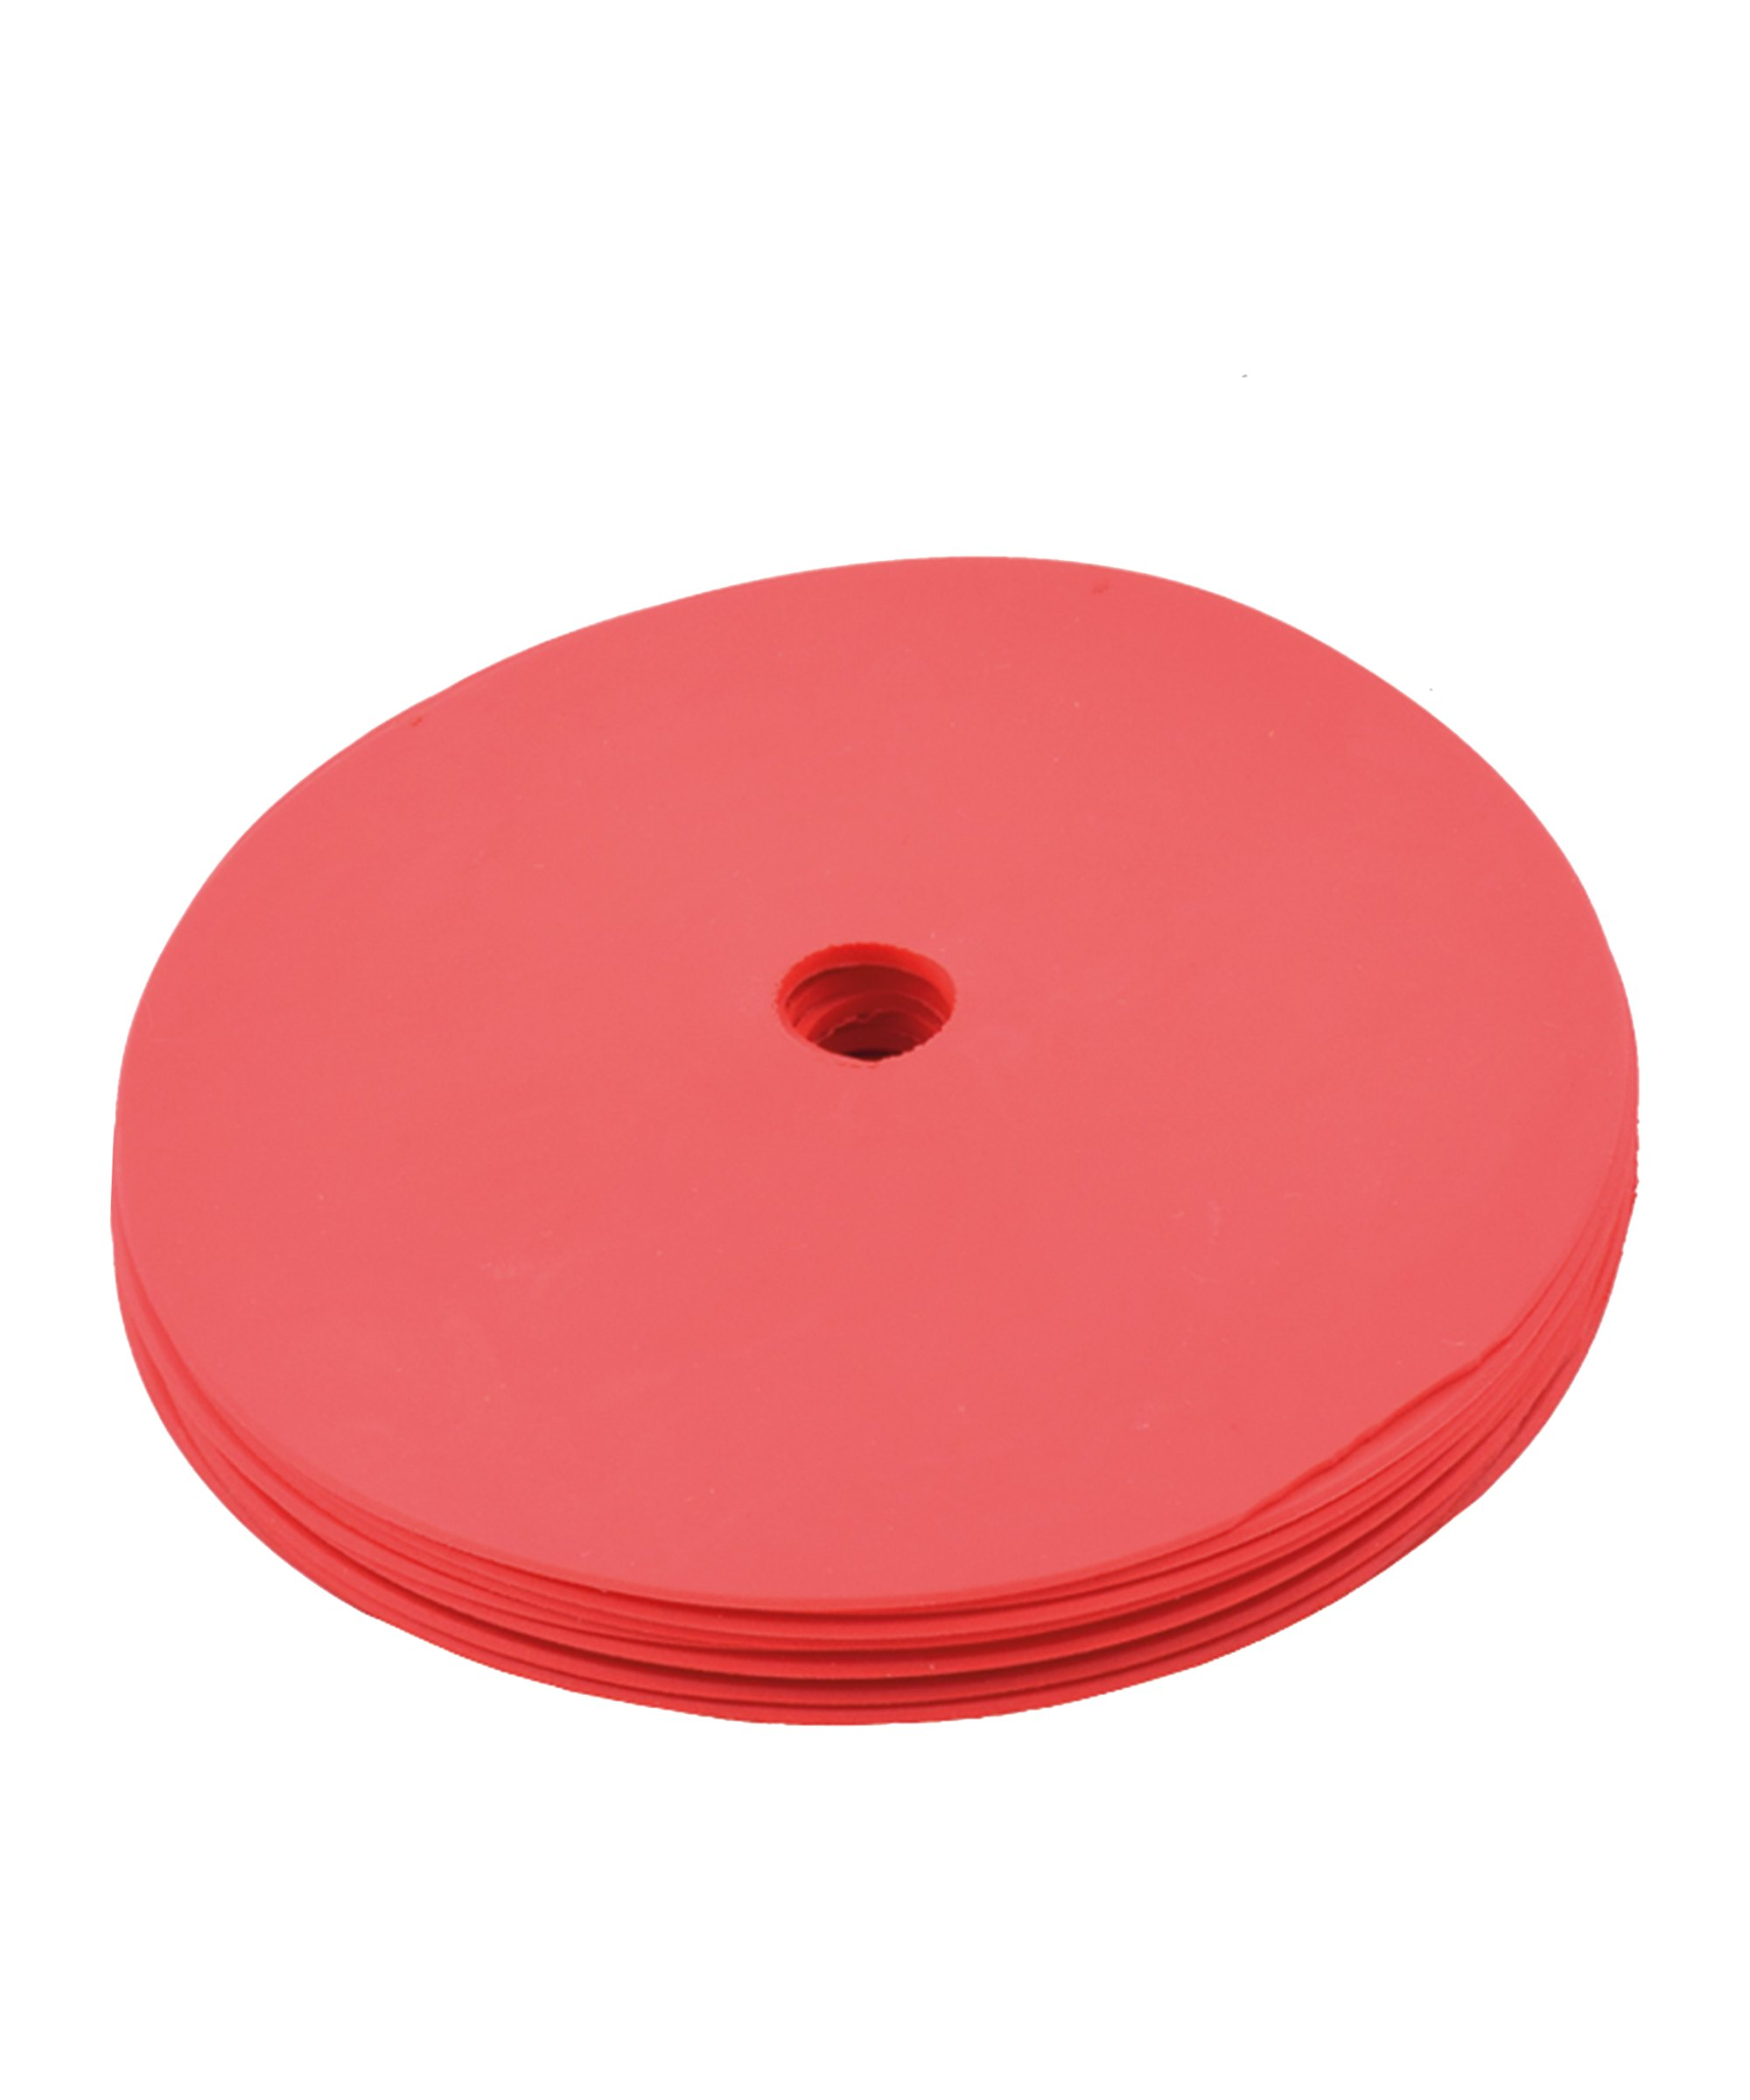 Cawila PRO TRAINING Floormark 10er Set d15mm Rot - rot